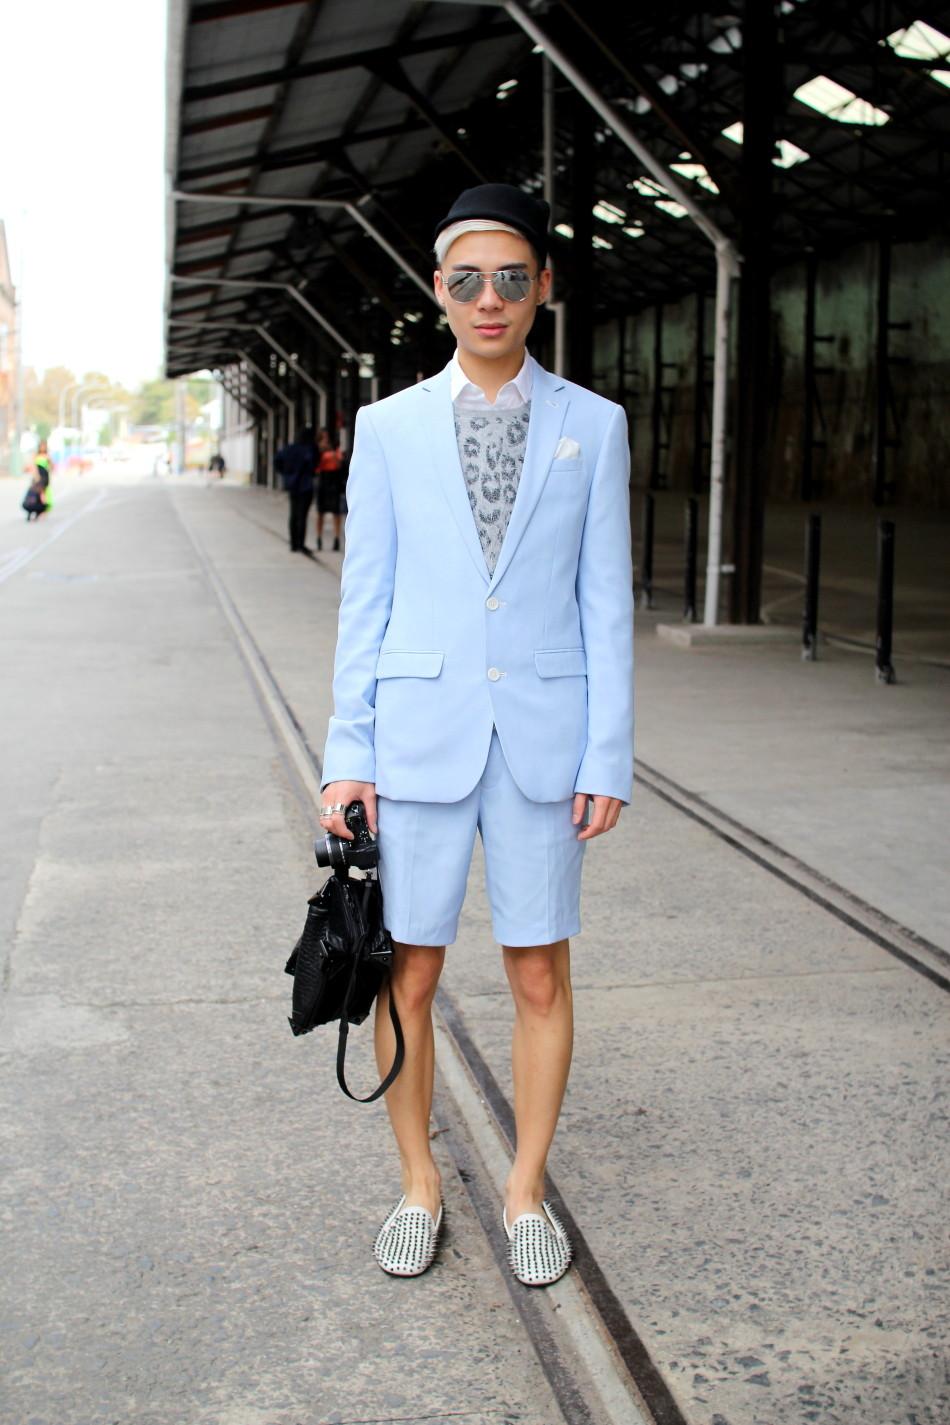 MBFWA fashion week street style baby blue suit menswear